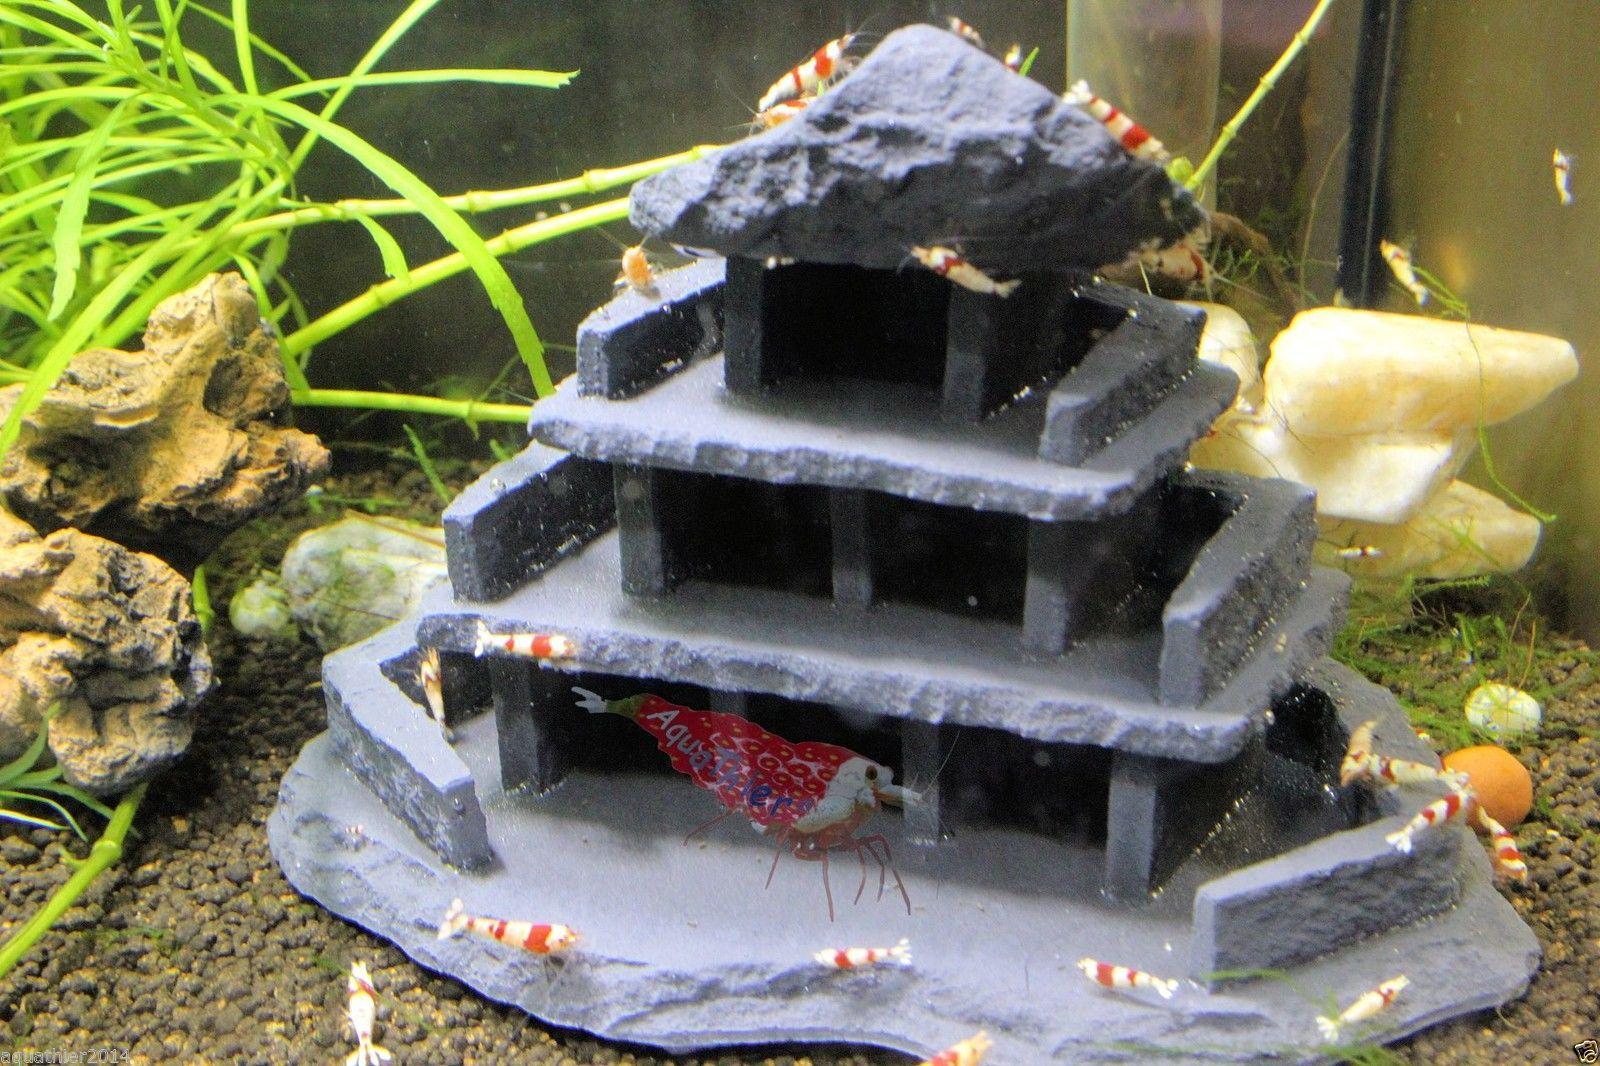 Garnelen Hotel - Midi Stone - Wels Höhle Haus - Deko - Aquarium - AquaThier   eBay